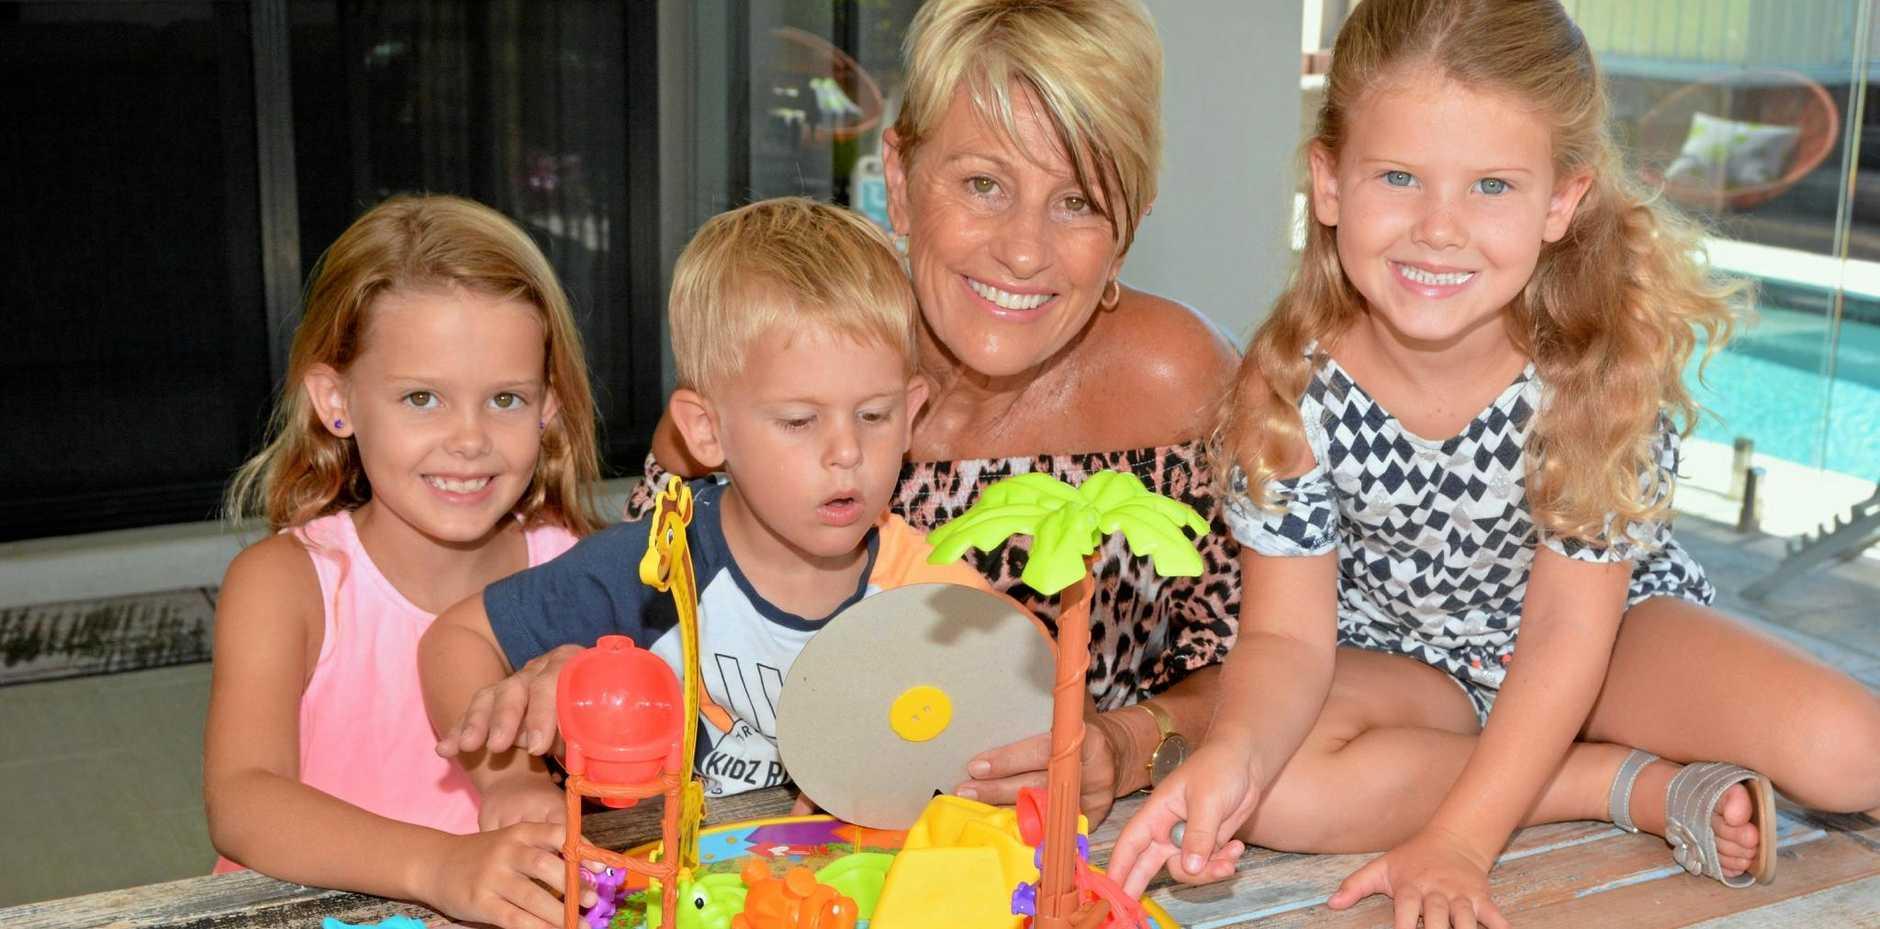 FAMILY TIES: Pottsville grandmother Jeanette Buchanan enjoys looking after her grandchildren (from left) Shiloh, Jax and Ivy Hart.